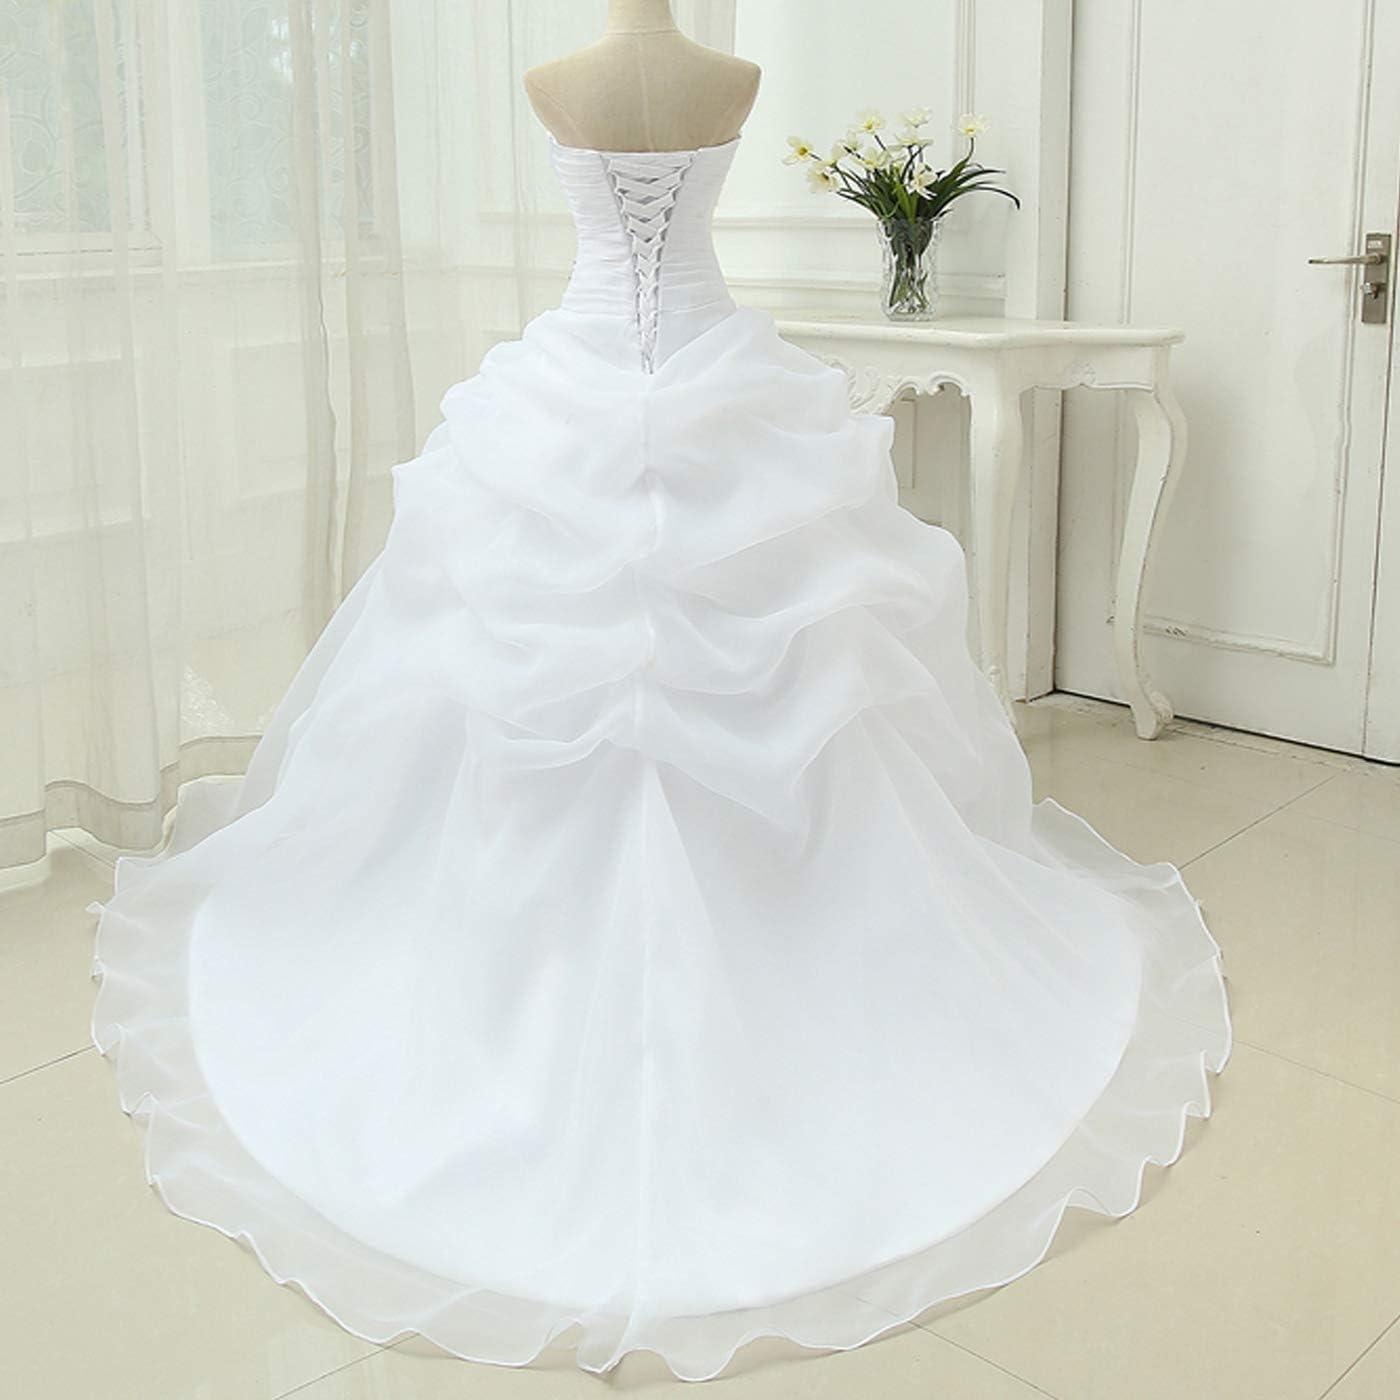 Yuxin Sweetheart Romantic Beading Wedding Dresses for Bride 2020 Long Ball Gown Bridal Dress